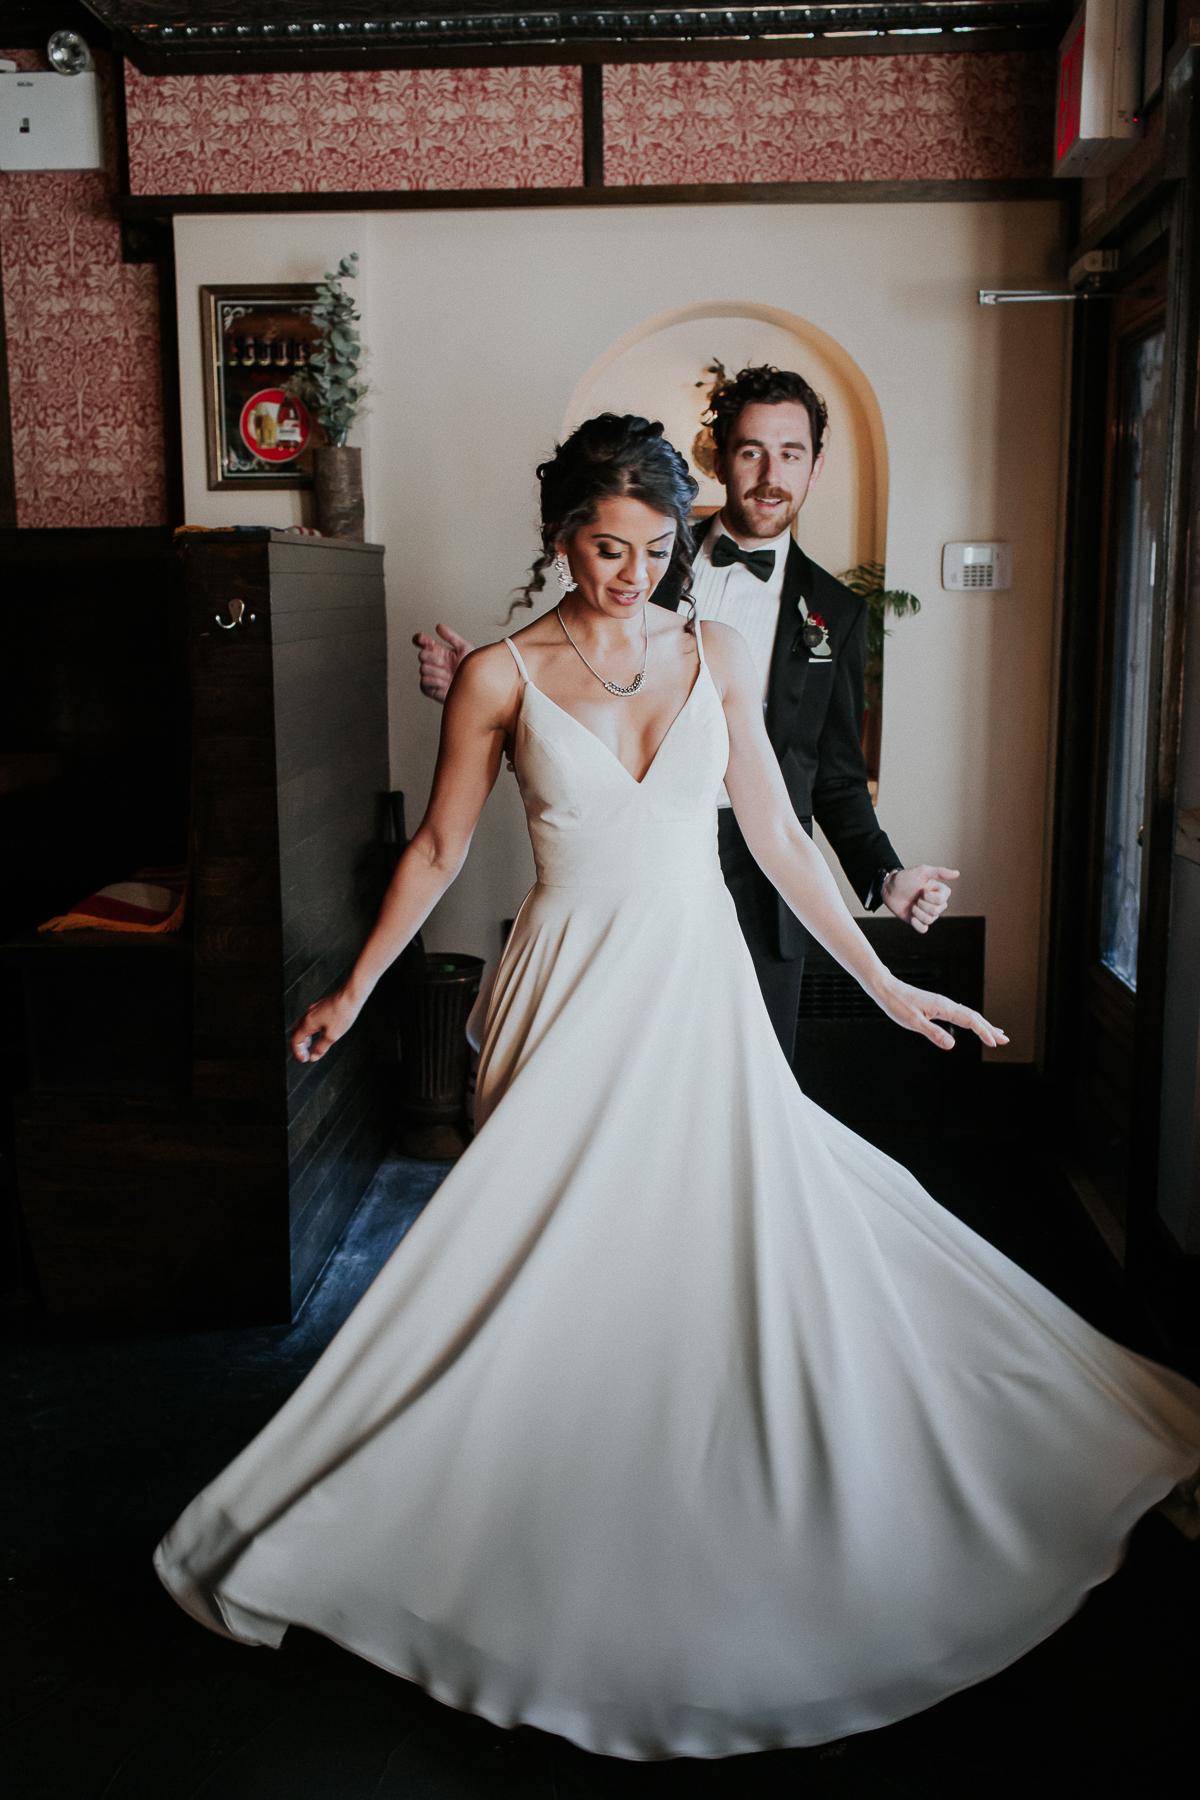 Humboldt-&-Jackson-Restaurant-Intimate-Brooklyn-Documentary-Wedding-Photographer-79.jpg